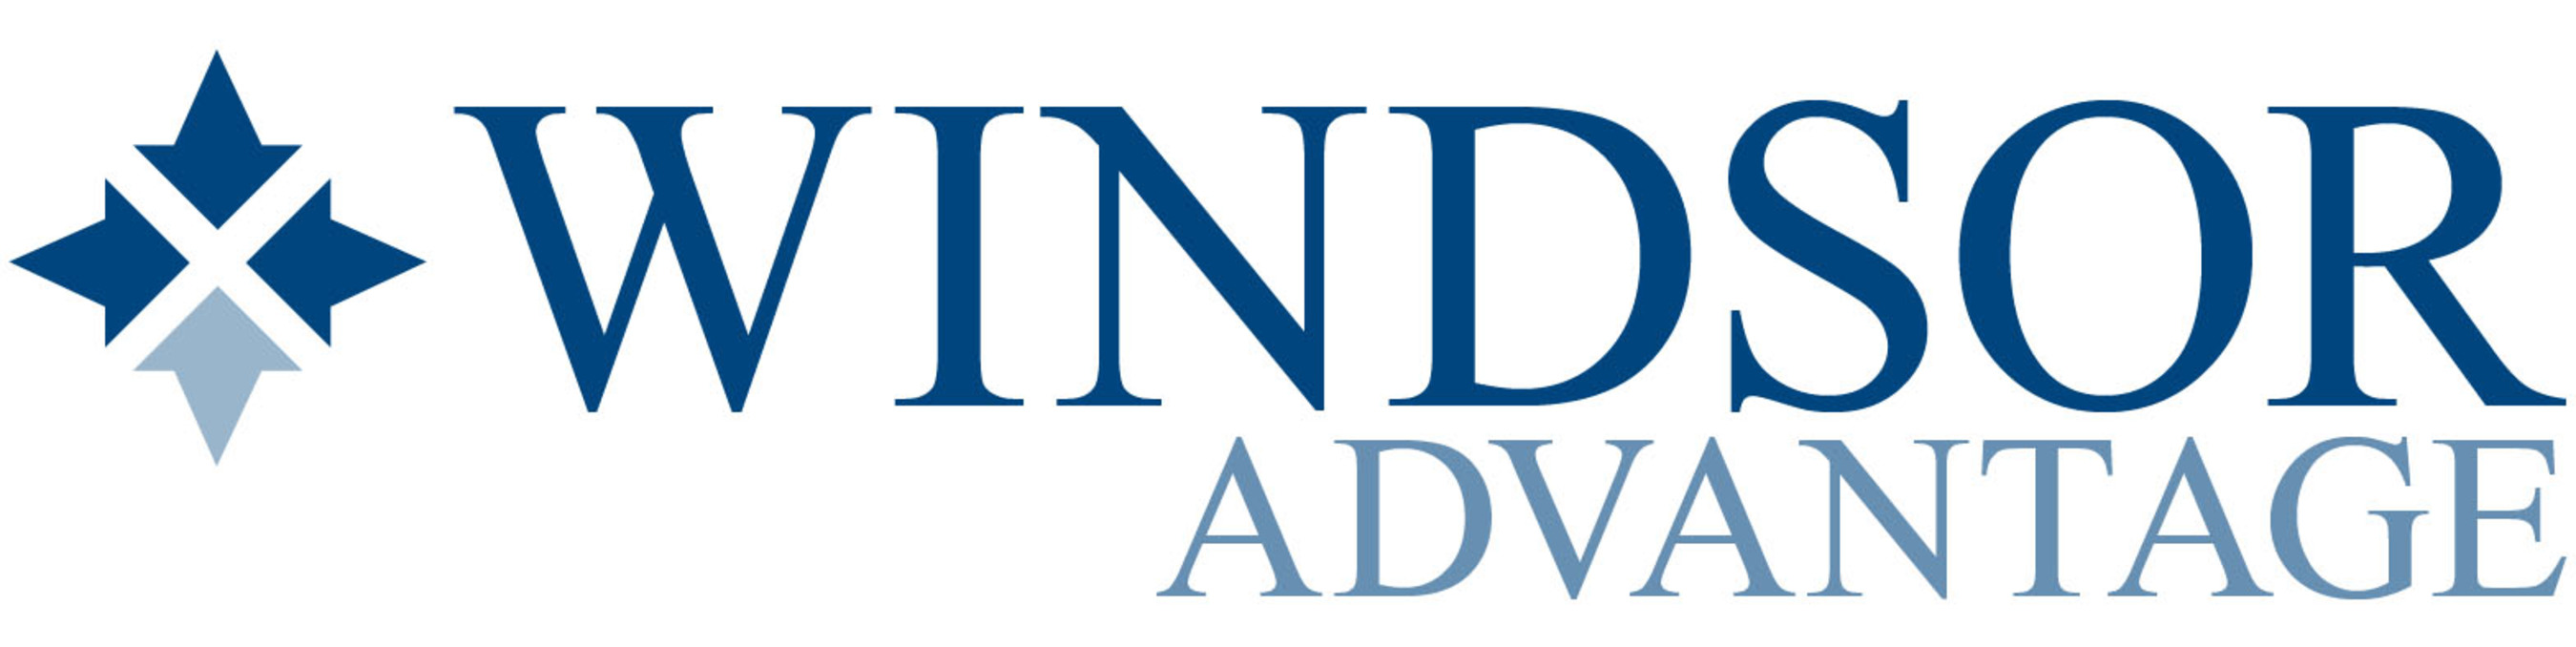 Windsor Advantage logo